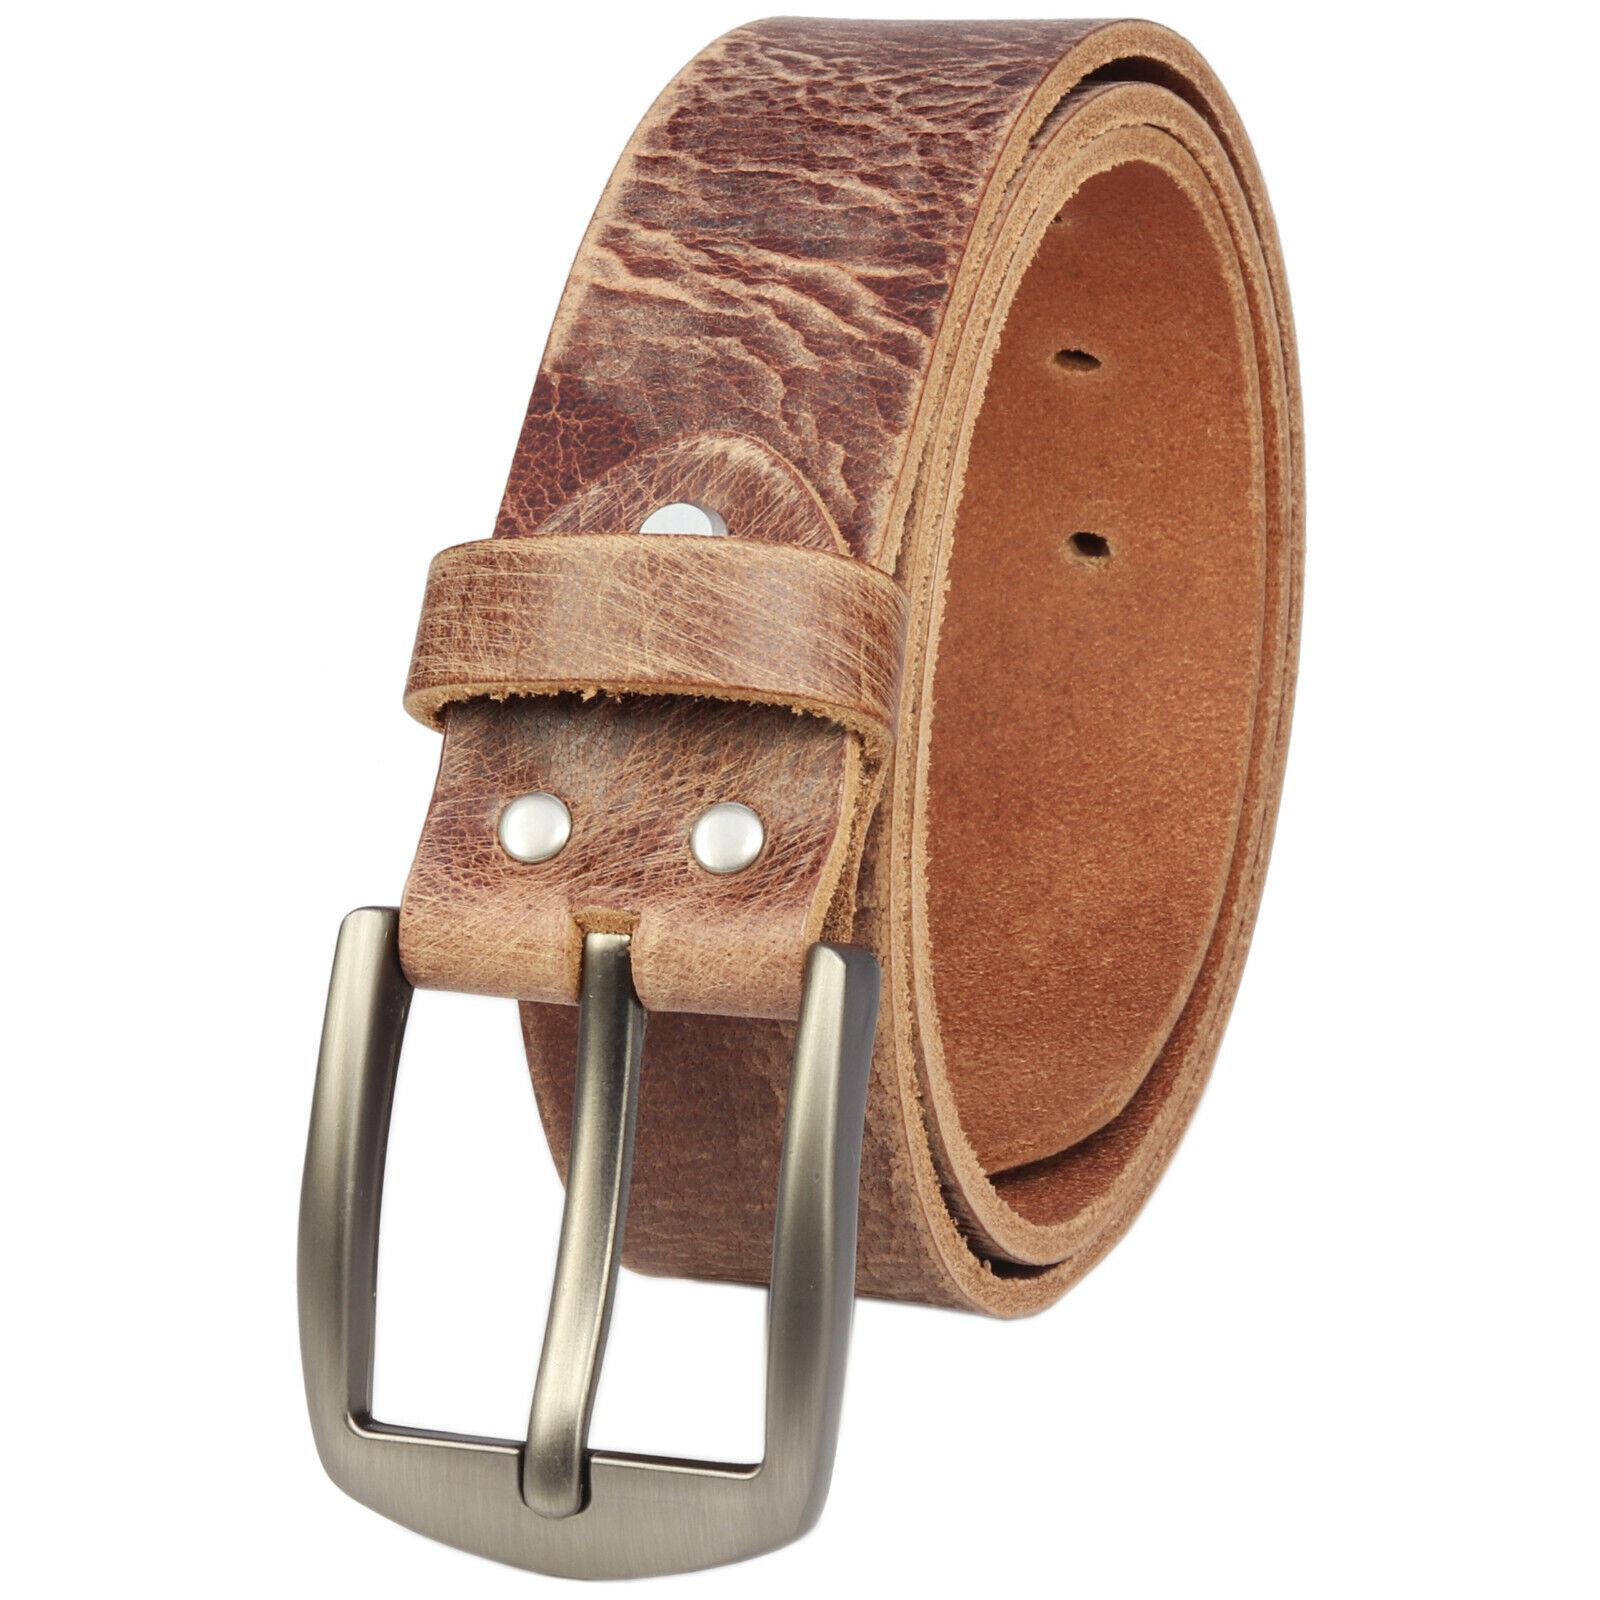 Ledergürtel 4cm echt Büffelleder Gürtel Leder Braun Herren Jeans Handgemacht NEU